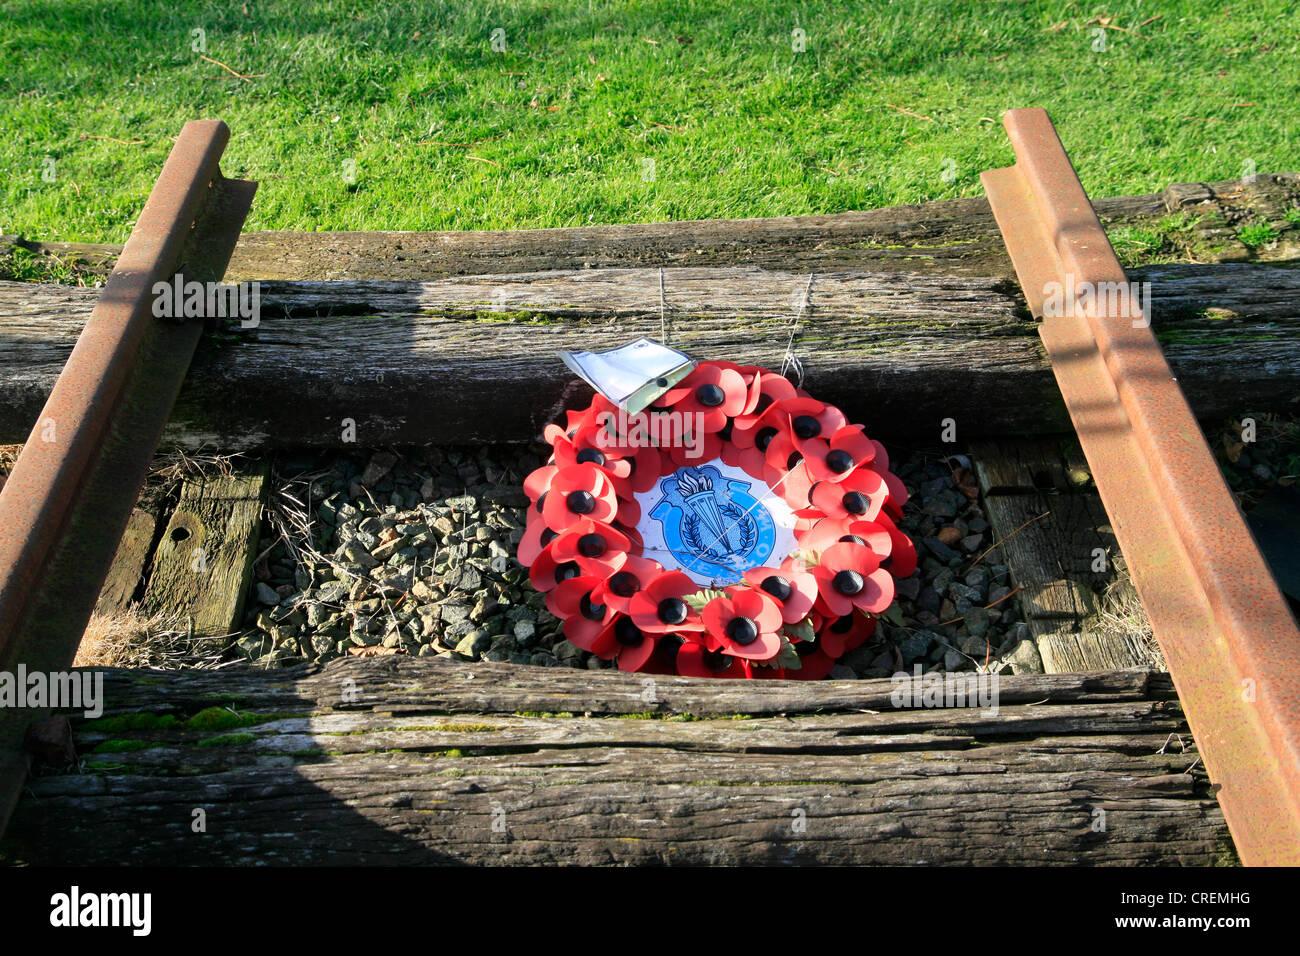 Burma Railway memorial poppy wreath National Memorial Arboretum Alrewas Staffordshire England UK - Stock Image